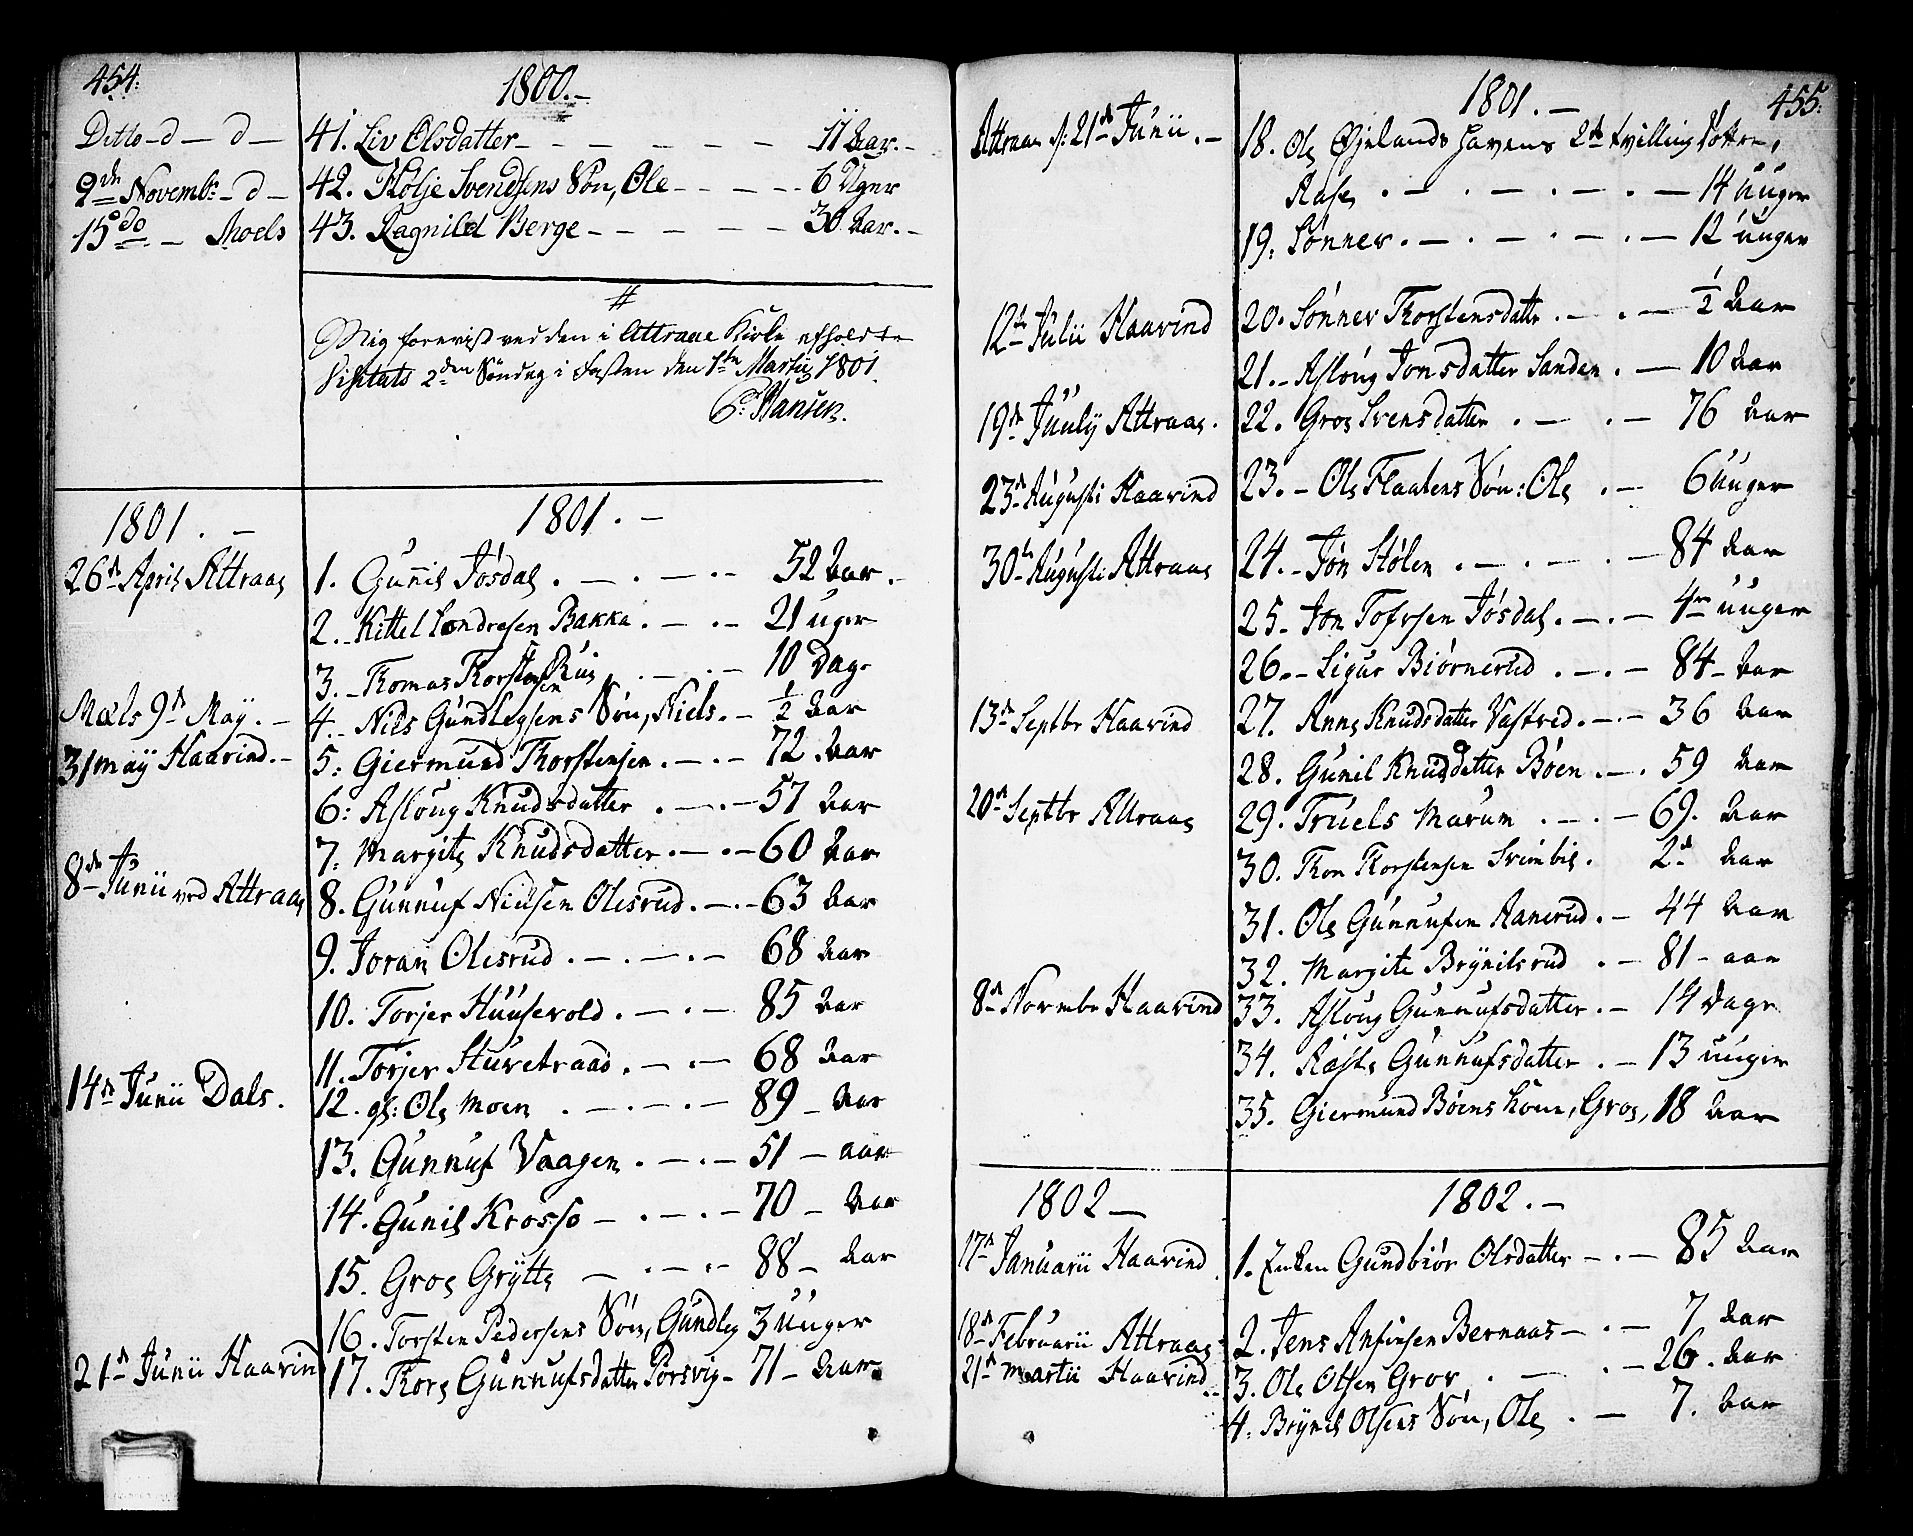 SAKO, Tinn kirkebøker, F/Fa/L0002: Ministerialbok nr. I 2, 1757-1810, s. 454-455